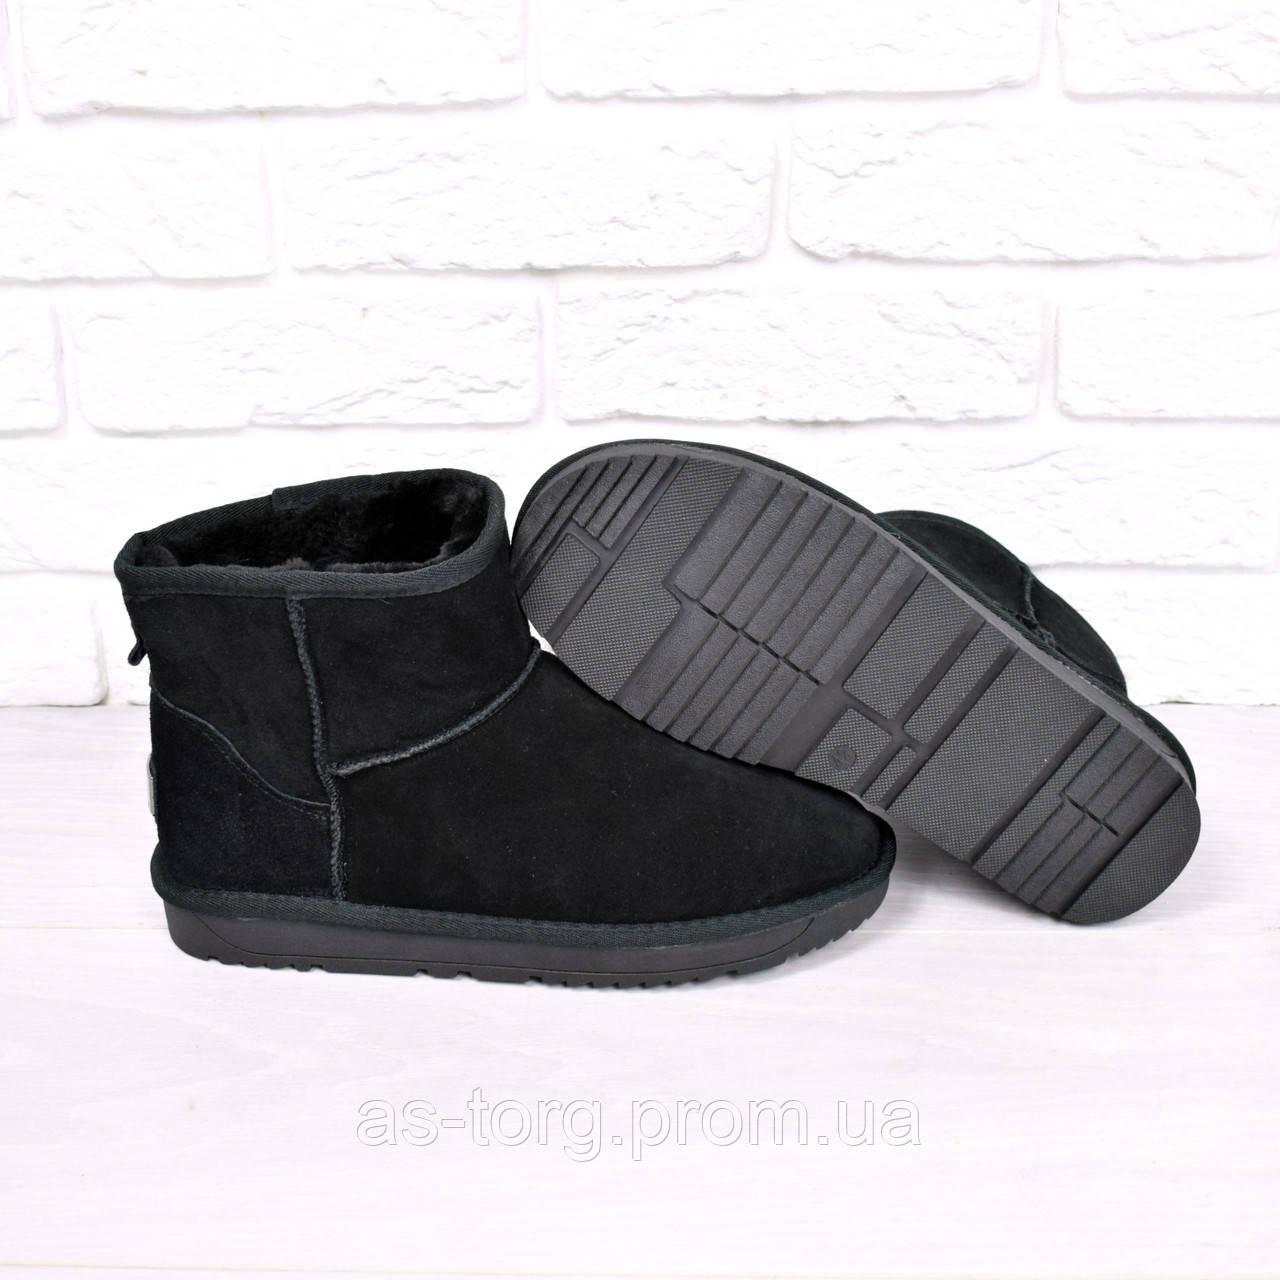 6ad03e985c5d Угги мужские ITTS натуральная замша 3717, зимняя обувь   продажа ...